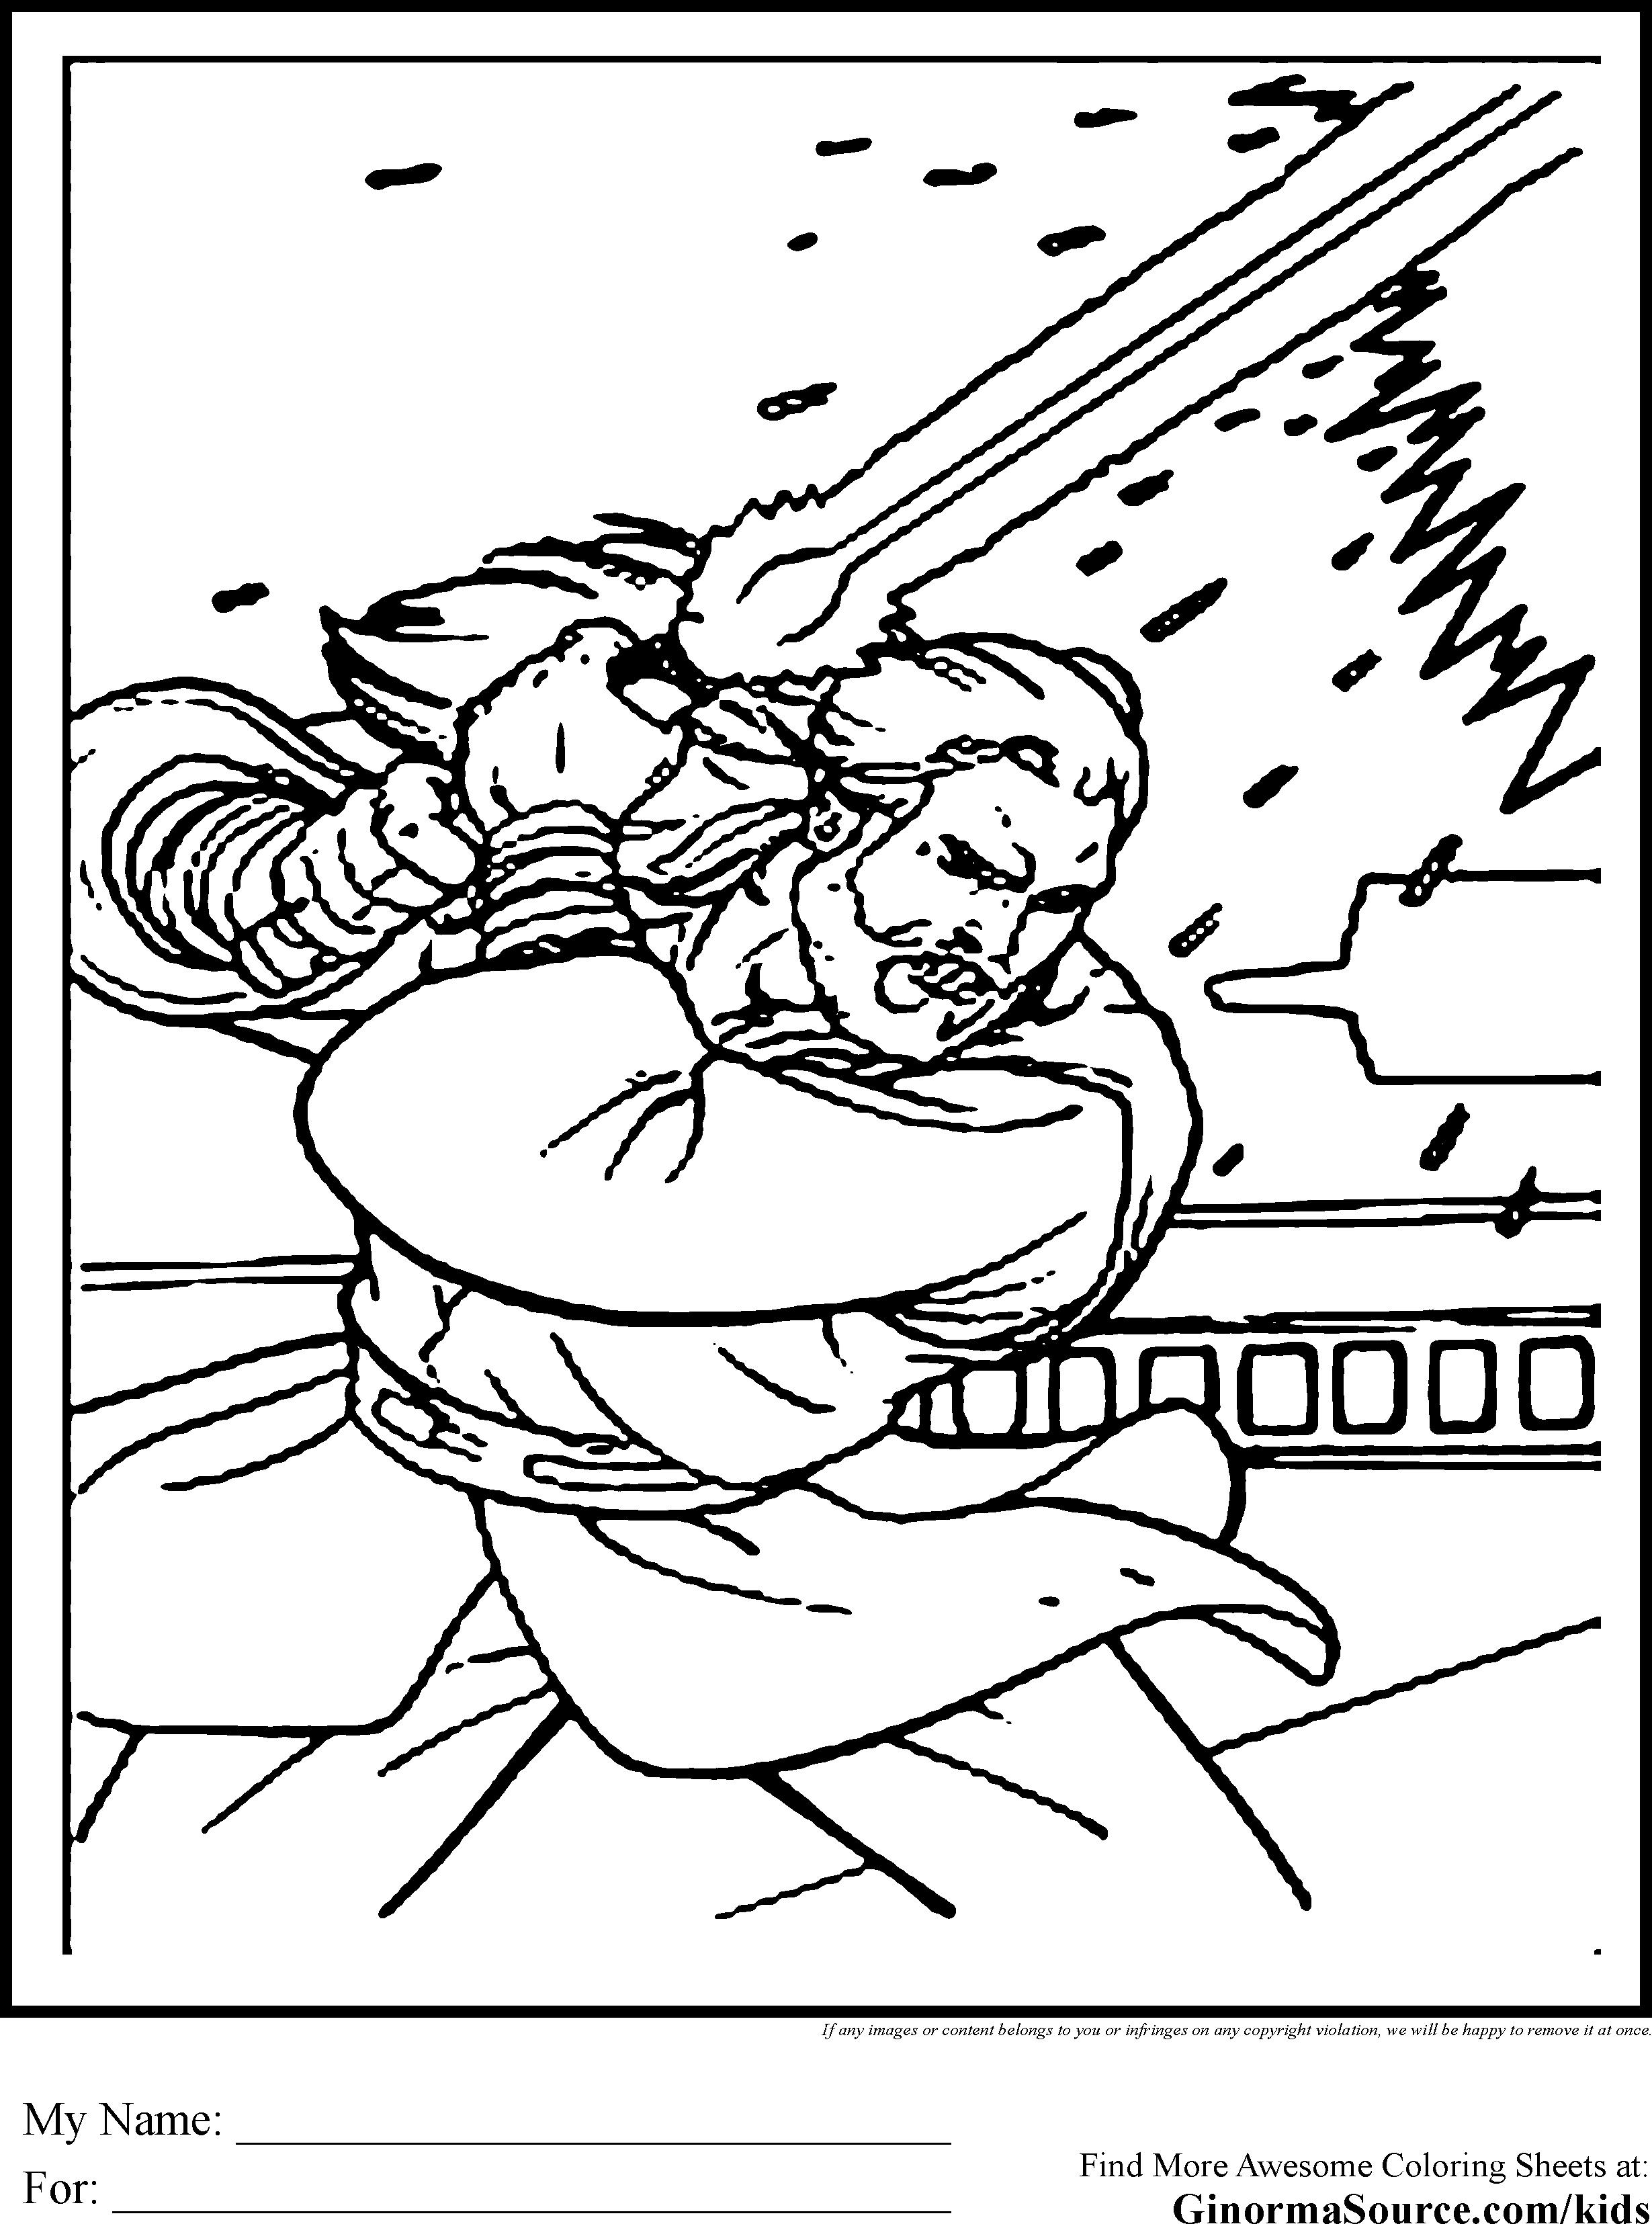 Star-Wars-Coloring-Pages-Obi-Wan-Kenobi.gif (2459×3310) | LineArt ...